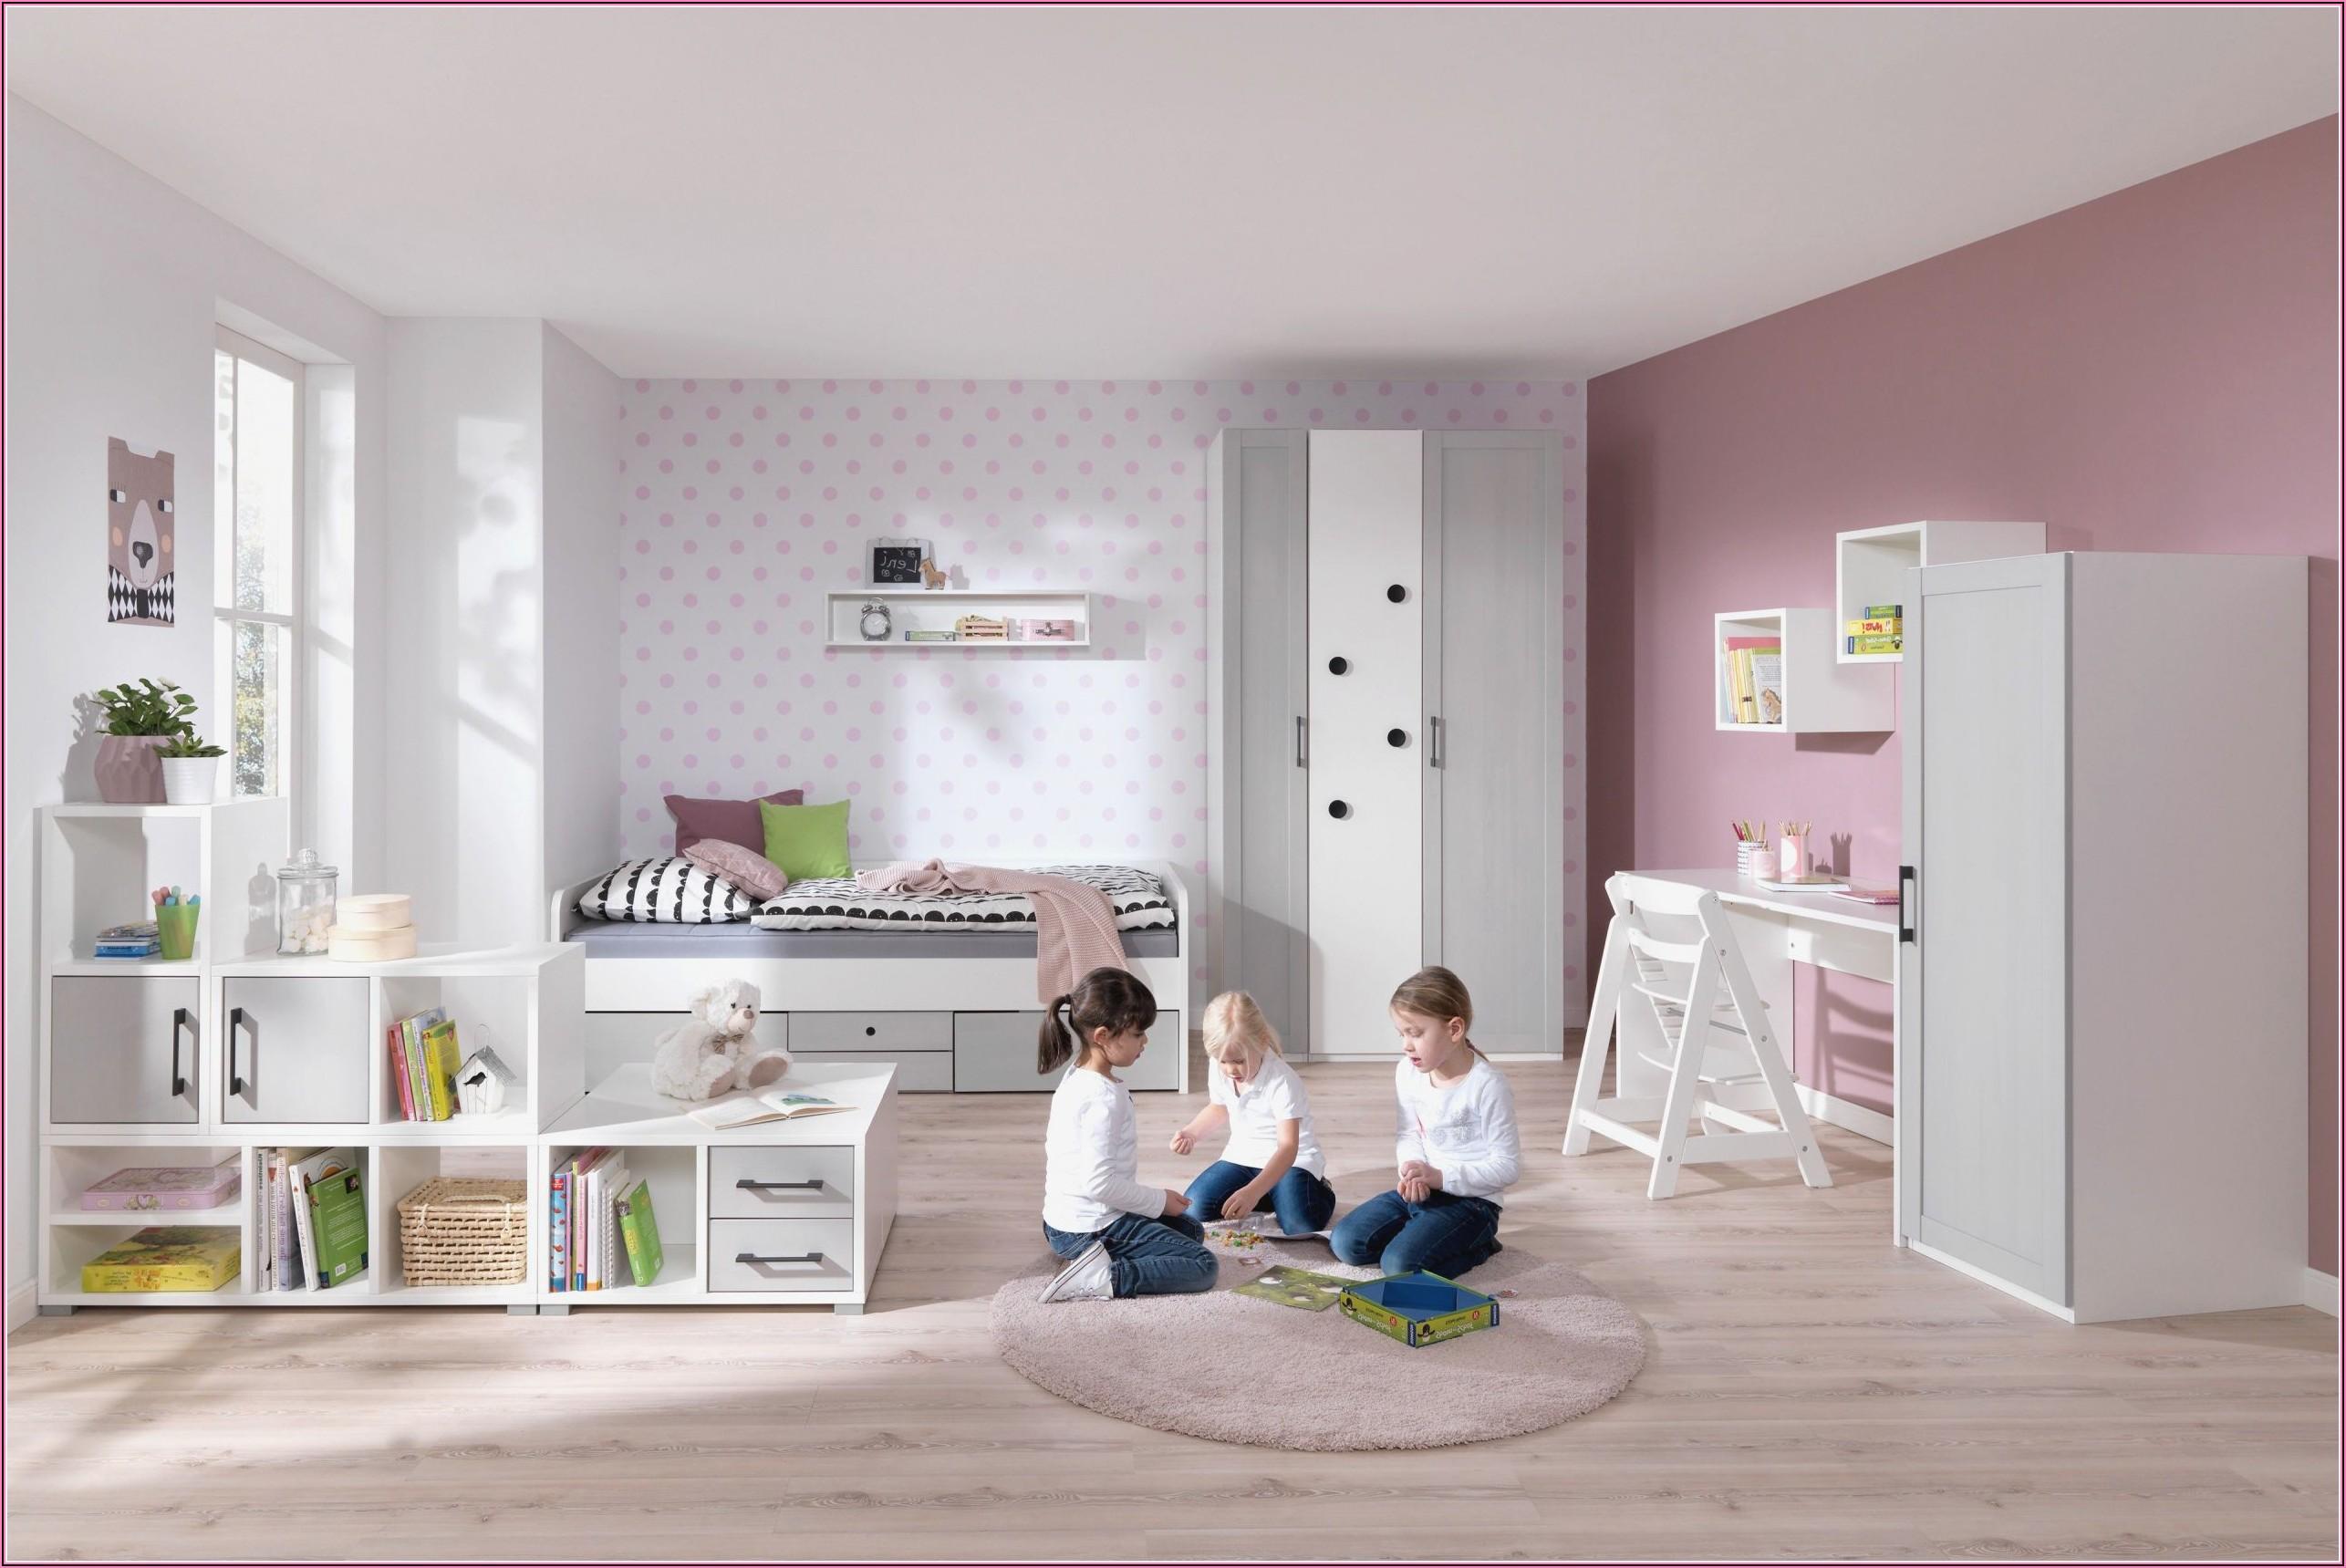 Kinderzimmer Rosa Grau Weiss